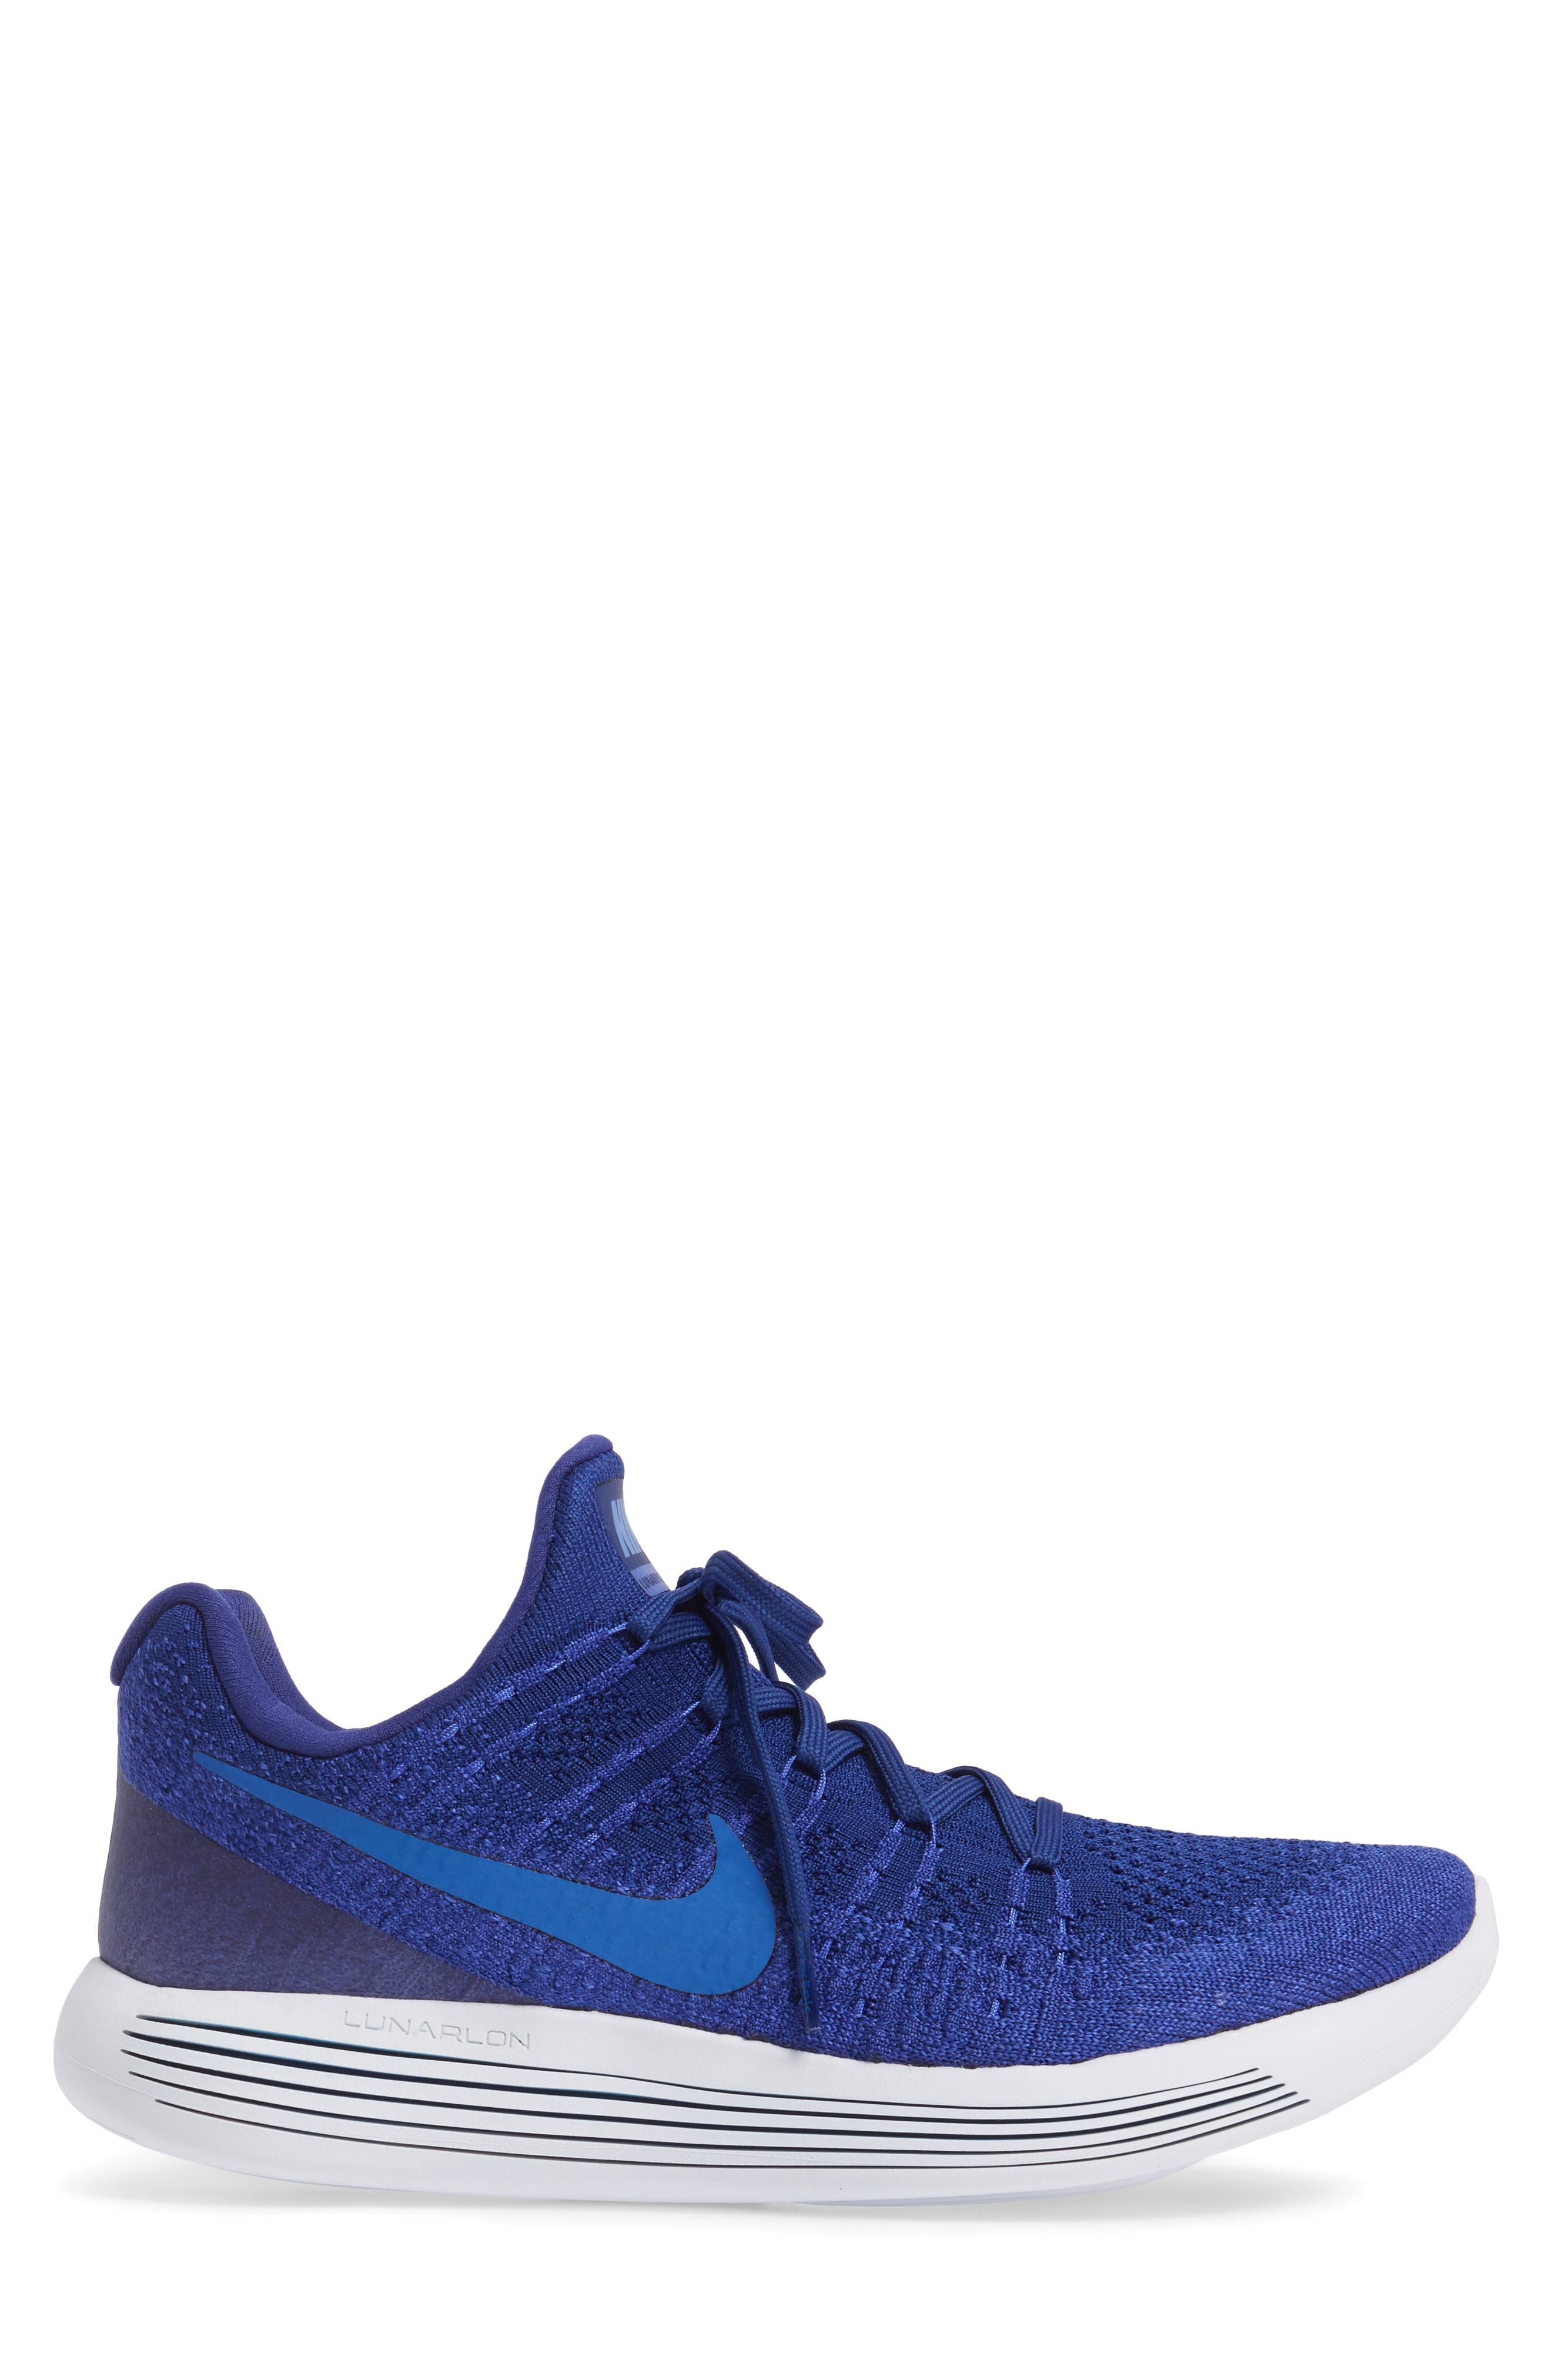 Alternate Image 3  - Nike Flyknit 2 LunarEpic Running Shoe (Men)